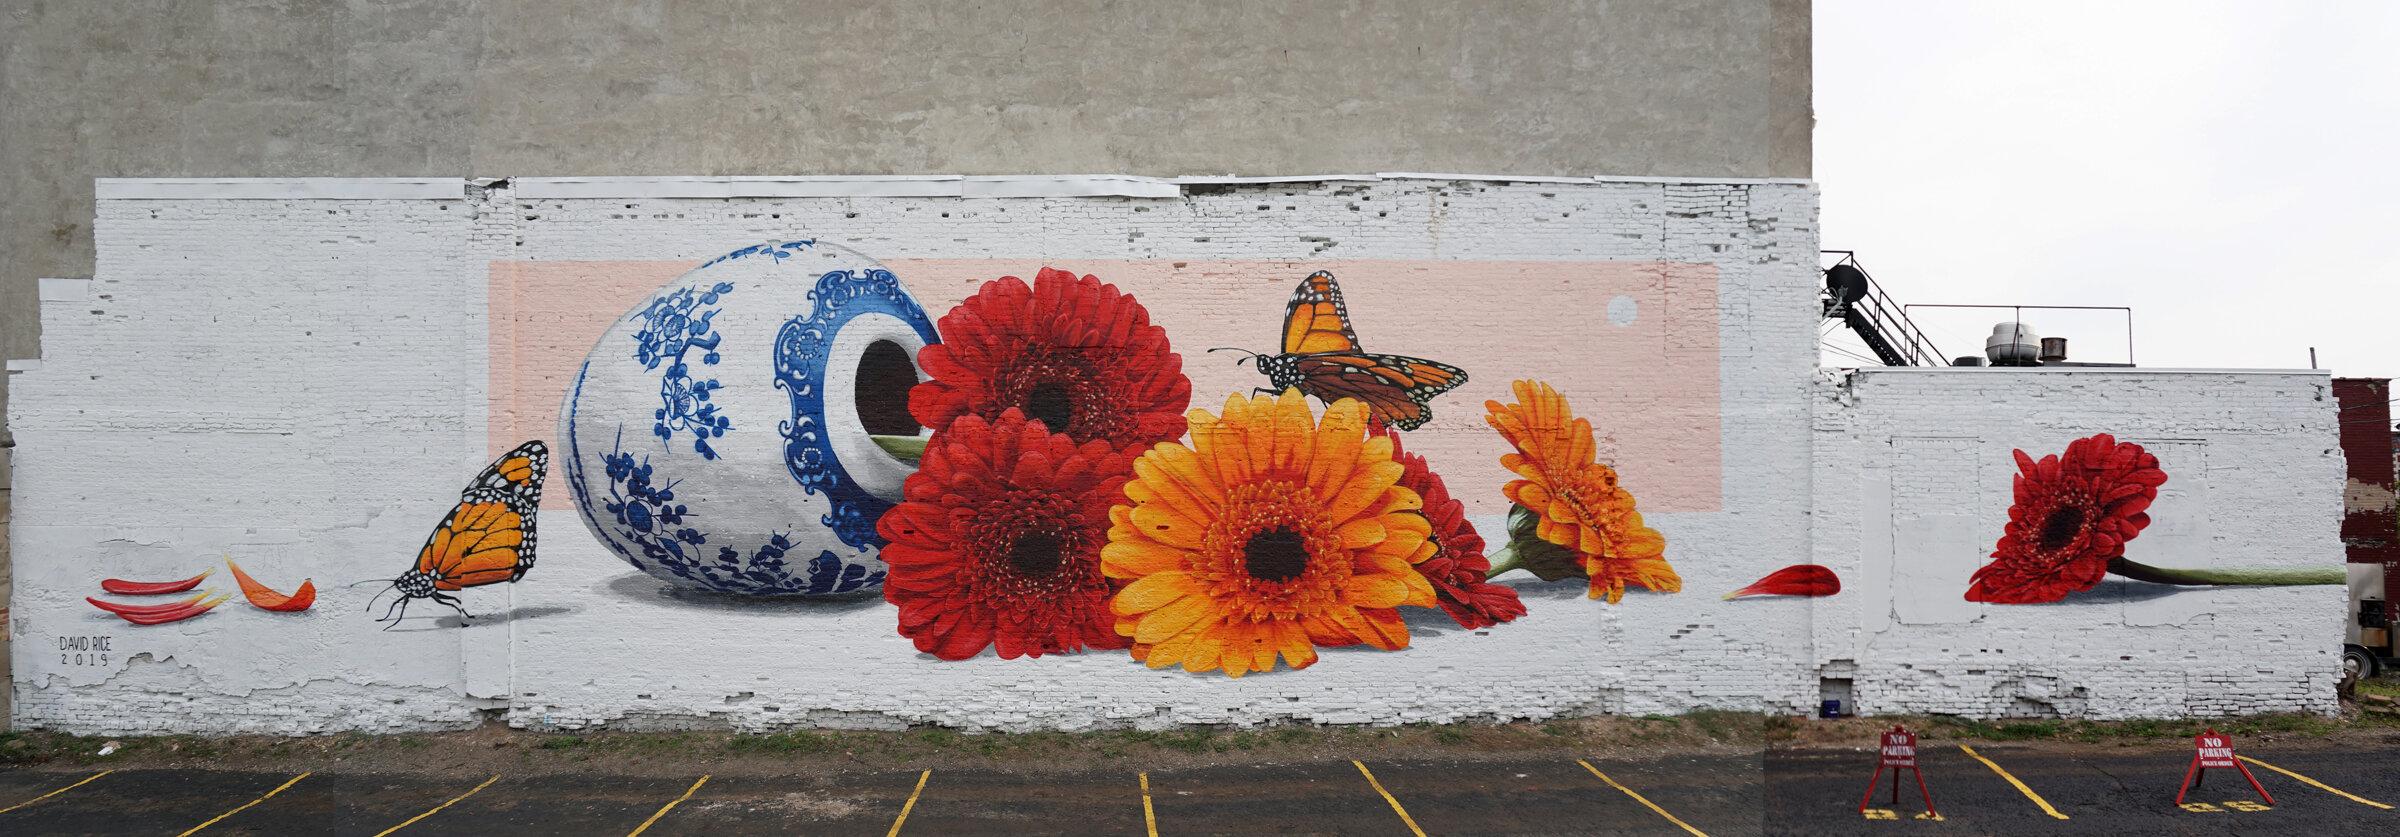 Mural for Bright Walls mural fest, Jackson, Michigan, 2019